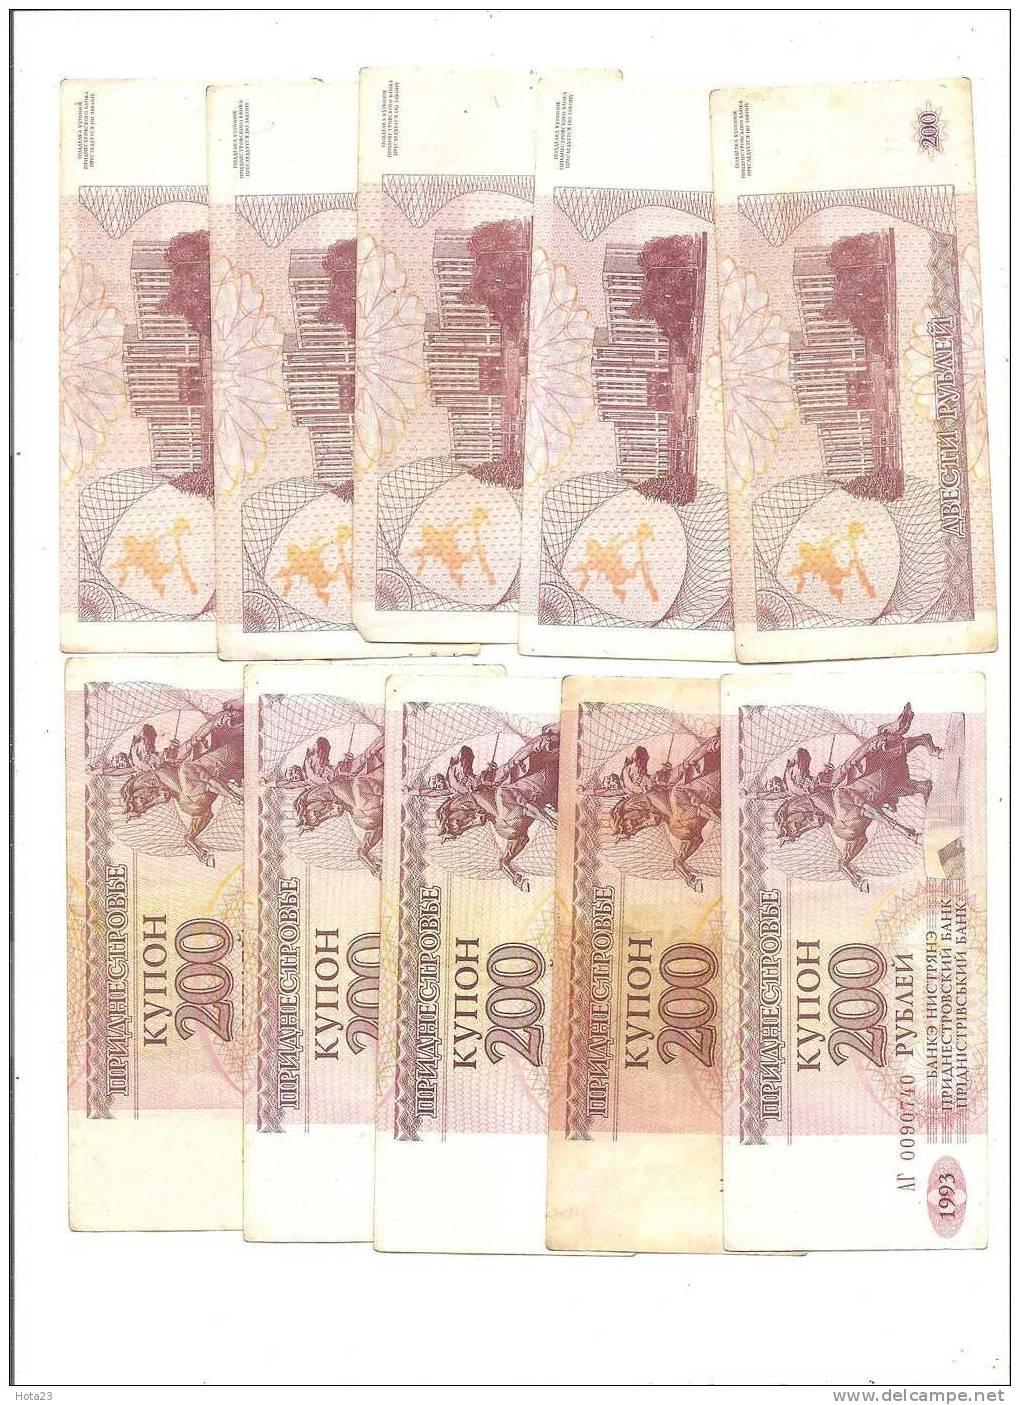 EX RUSSLAND Transnistrien 200 Rubel 1993 GEBRAUCHT X 10 Stück - Bankbiljetten